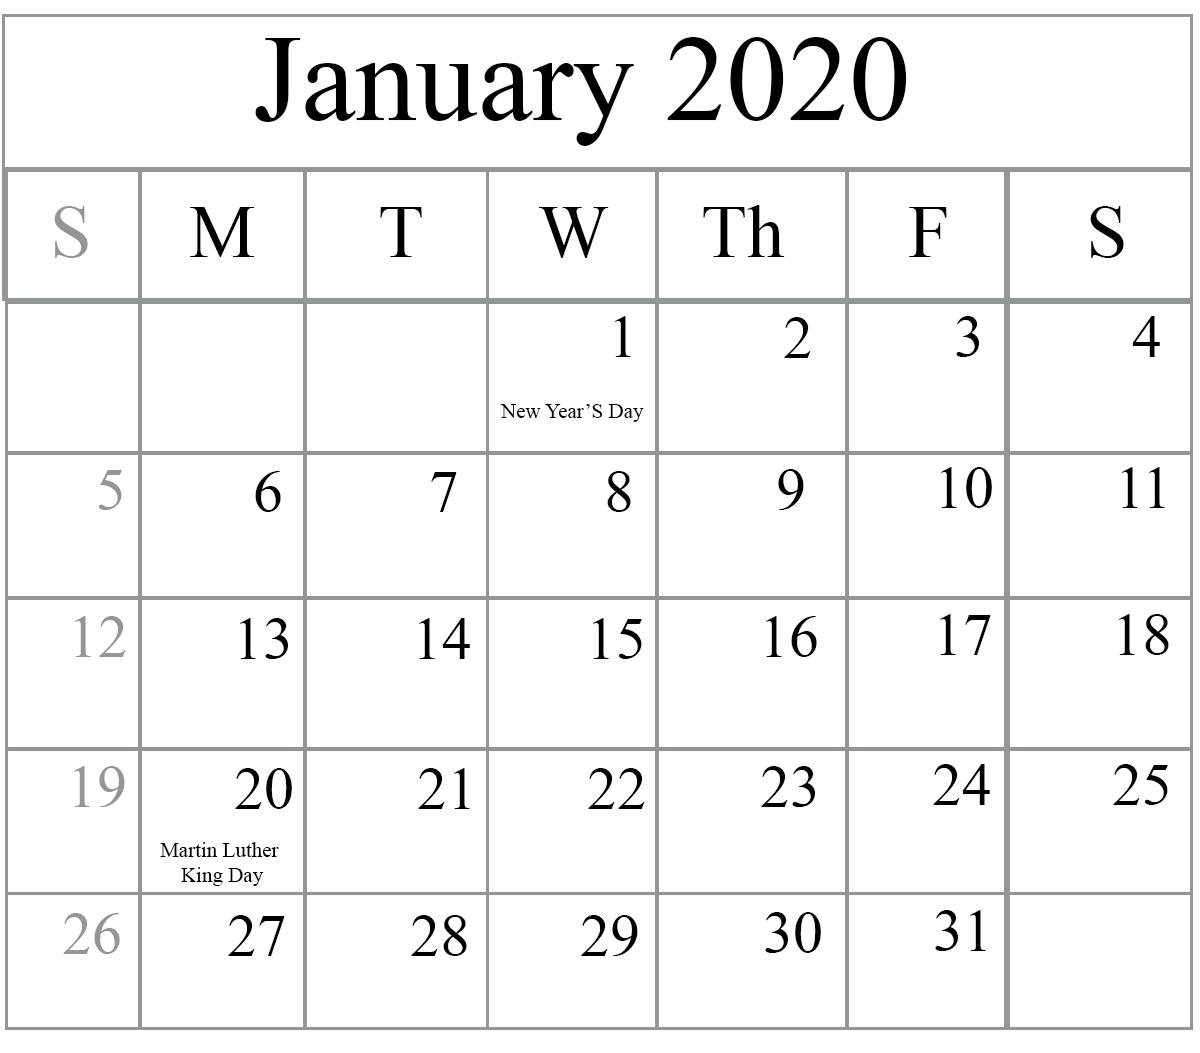 2020 Monthly Calendar Printable With Holidays - Wpa.wpart.co pertaining to 2020 Printable Monthly Calendar Free Vertex